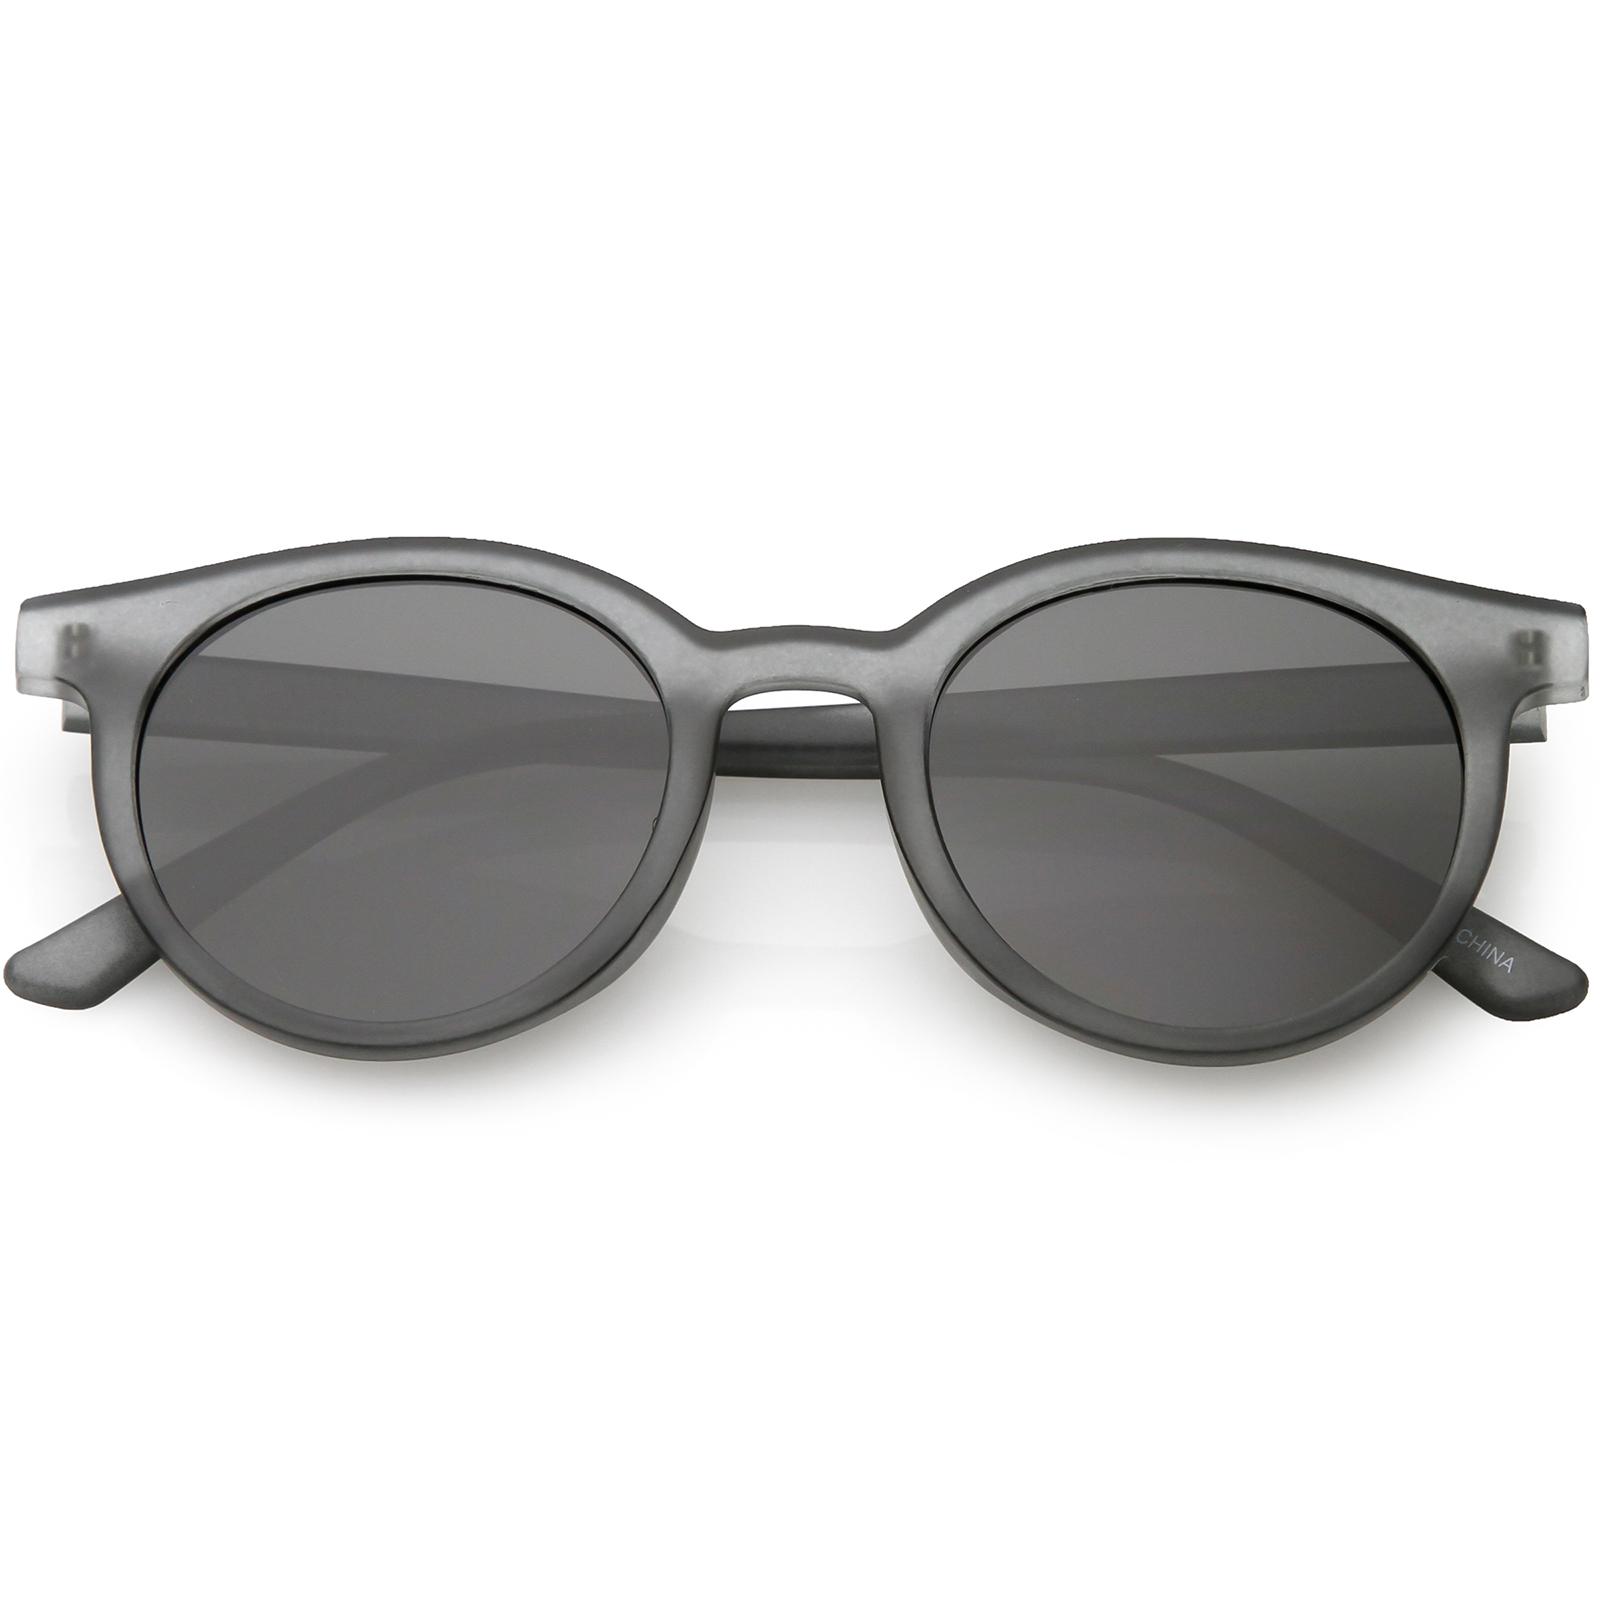 a5b1b29fb Retro Horn Rimmed Sunglasses Round Neutral Colored Flat Lens 51mm (Tortoise  / Brown )